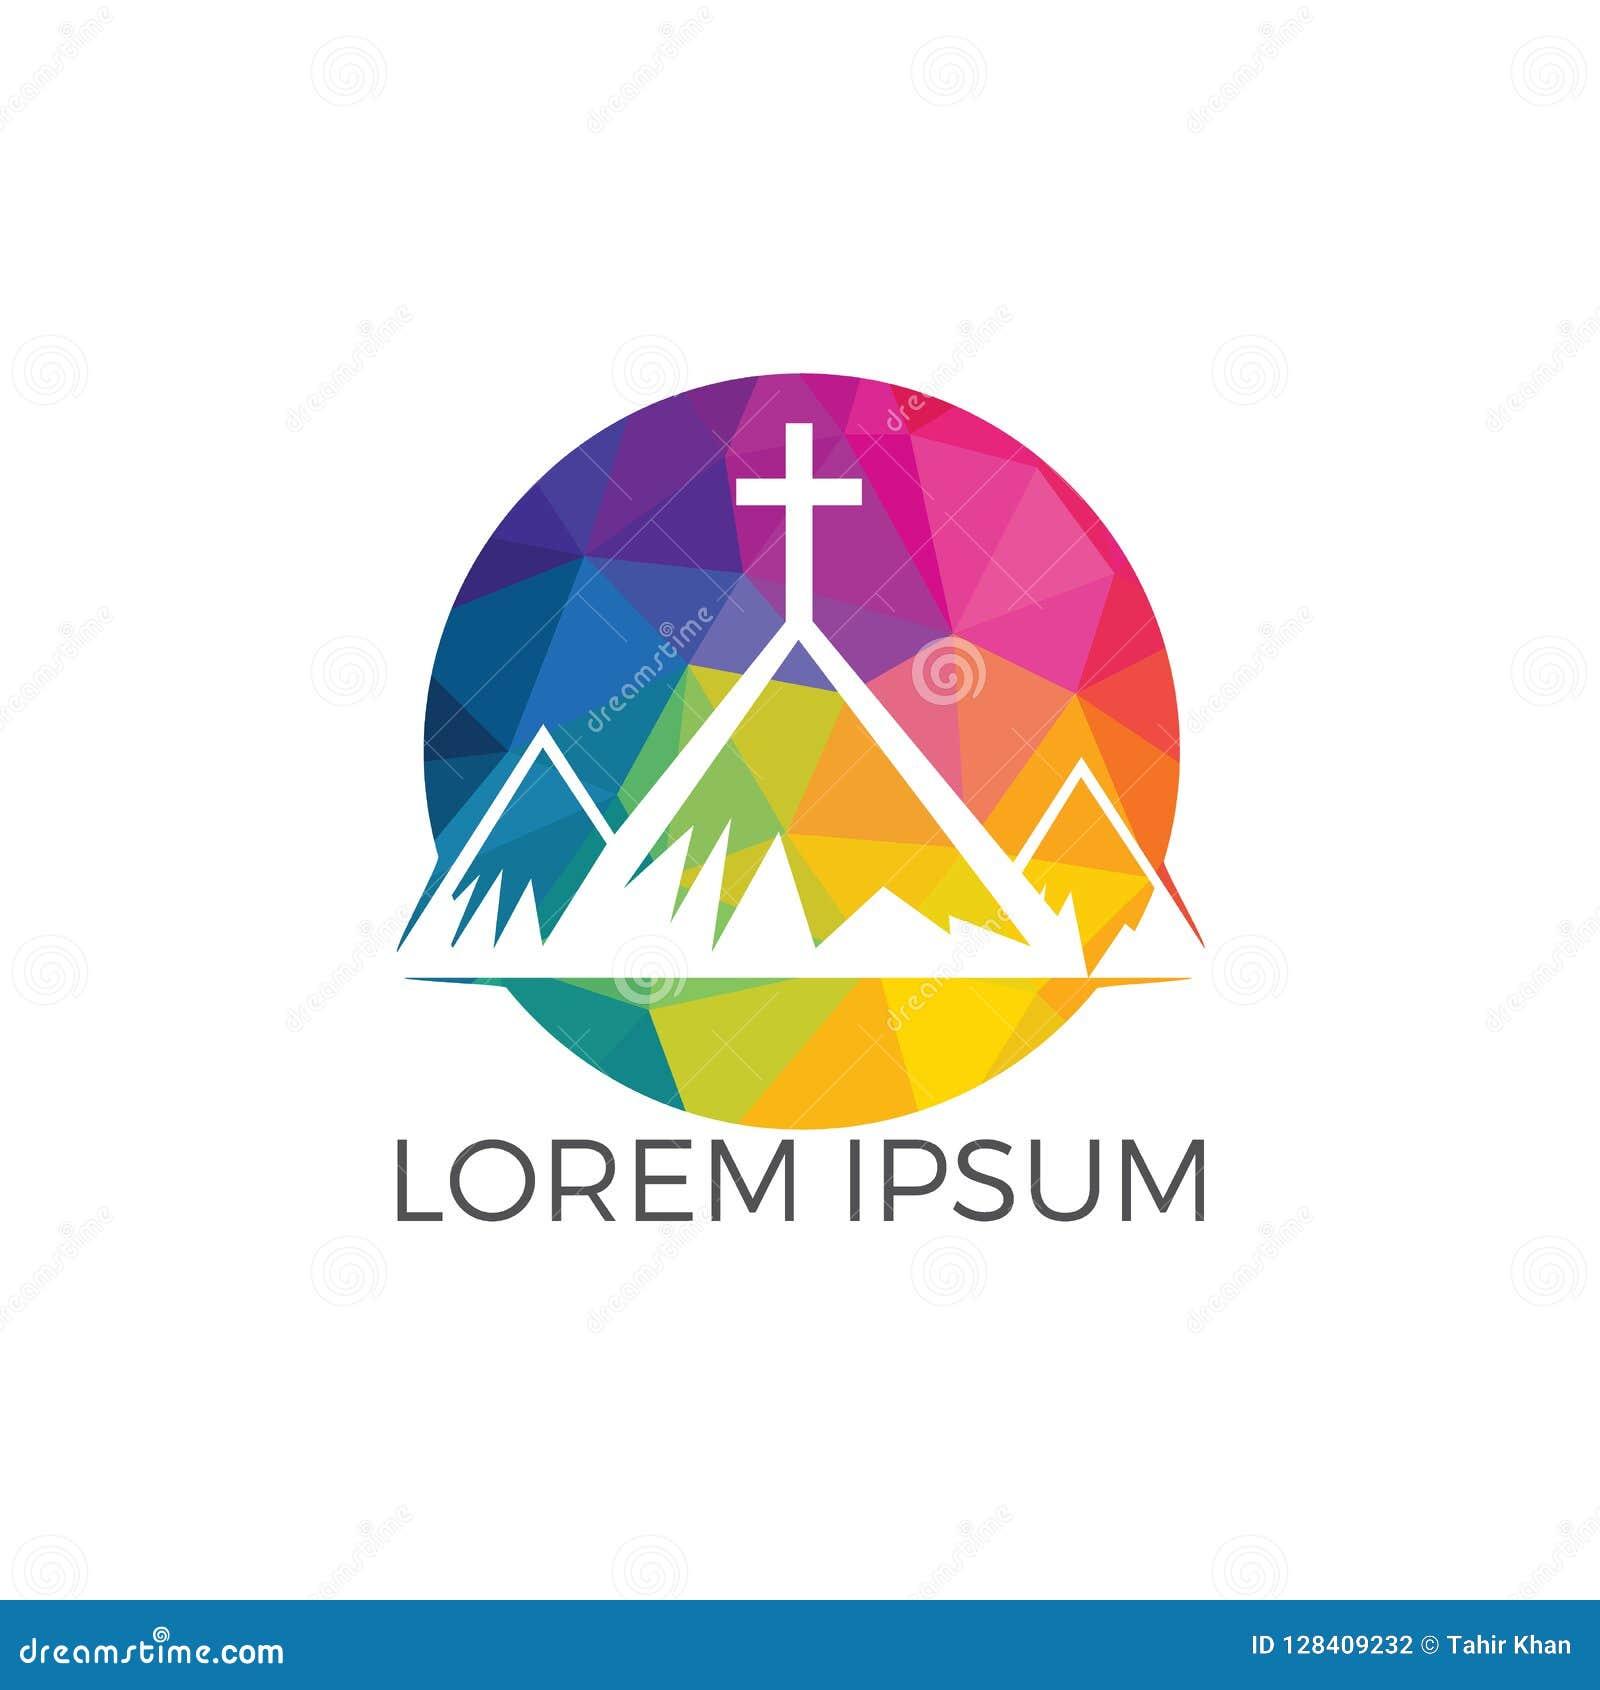 Baptist cross in mountain logo design.